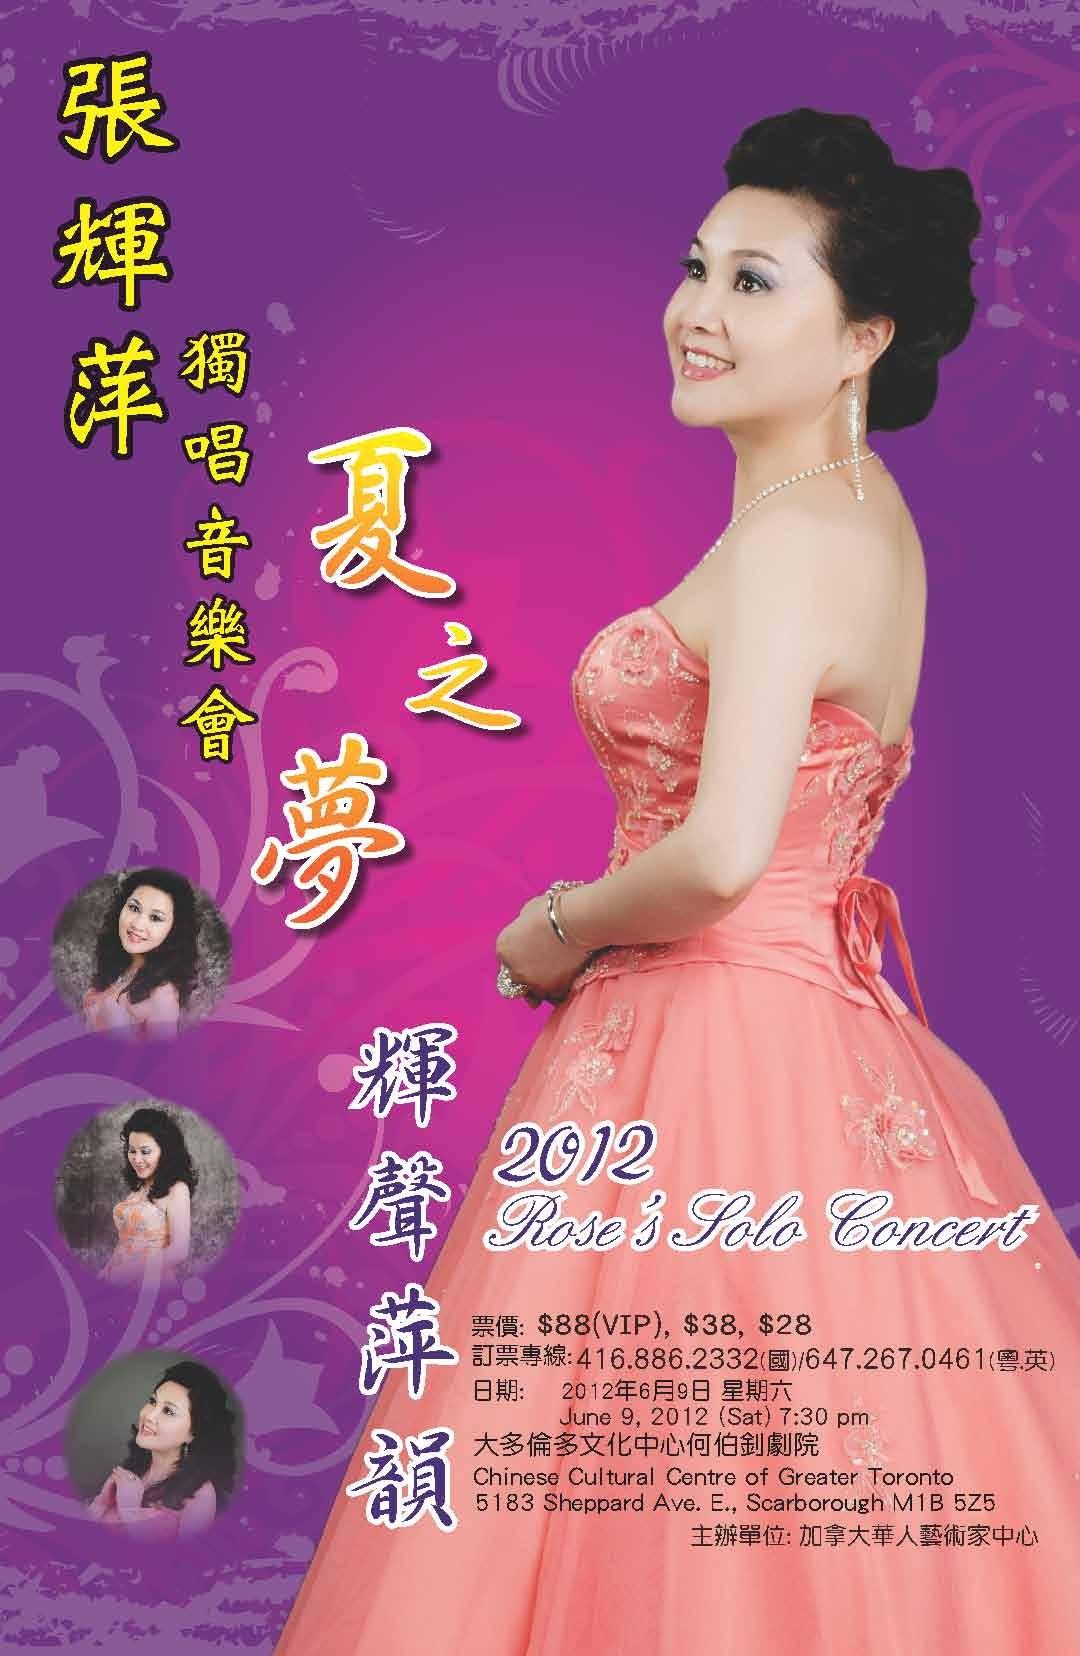 Rose Zhang June 9 2012 Concert Poster.jpg